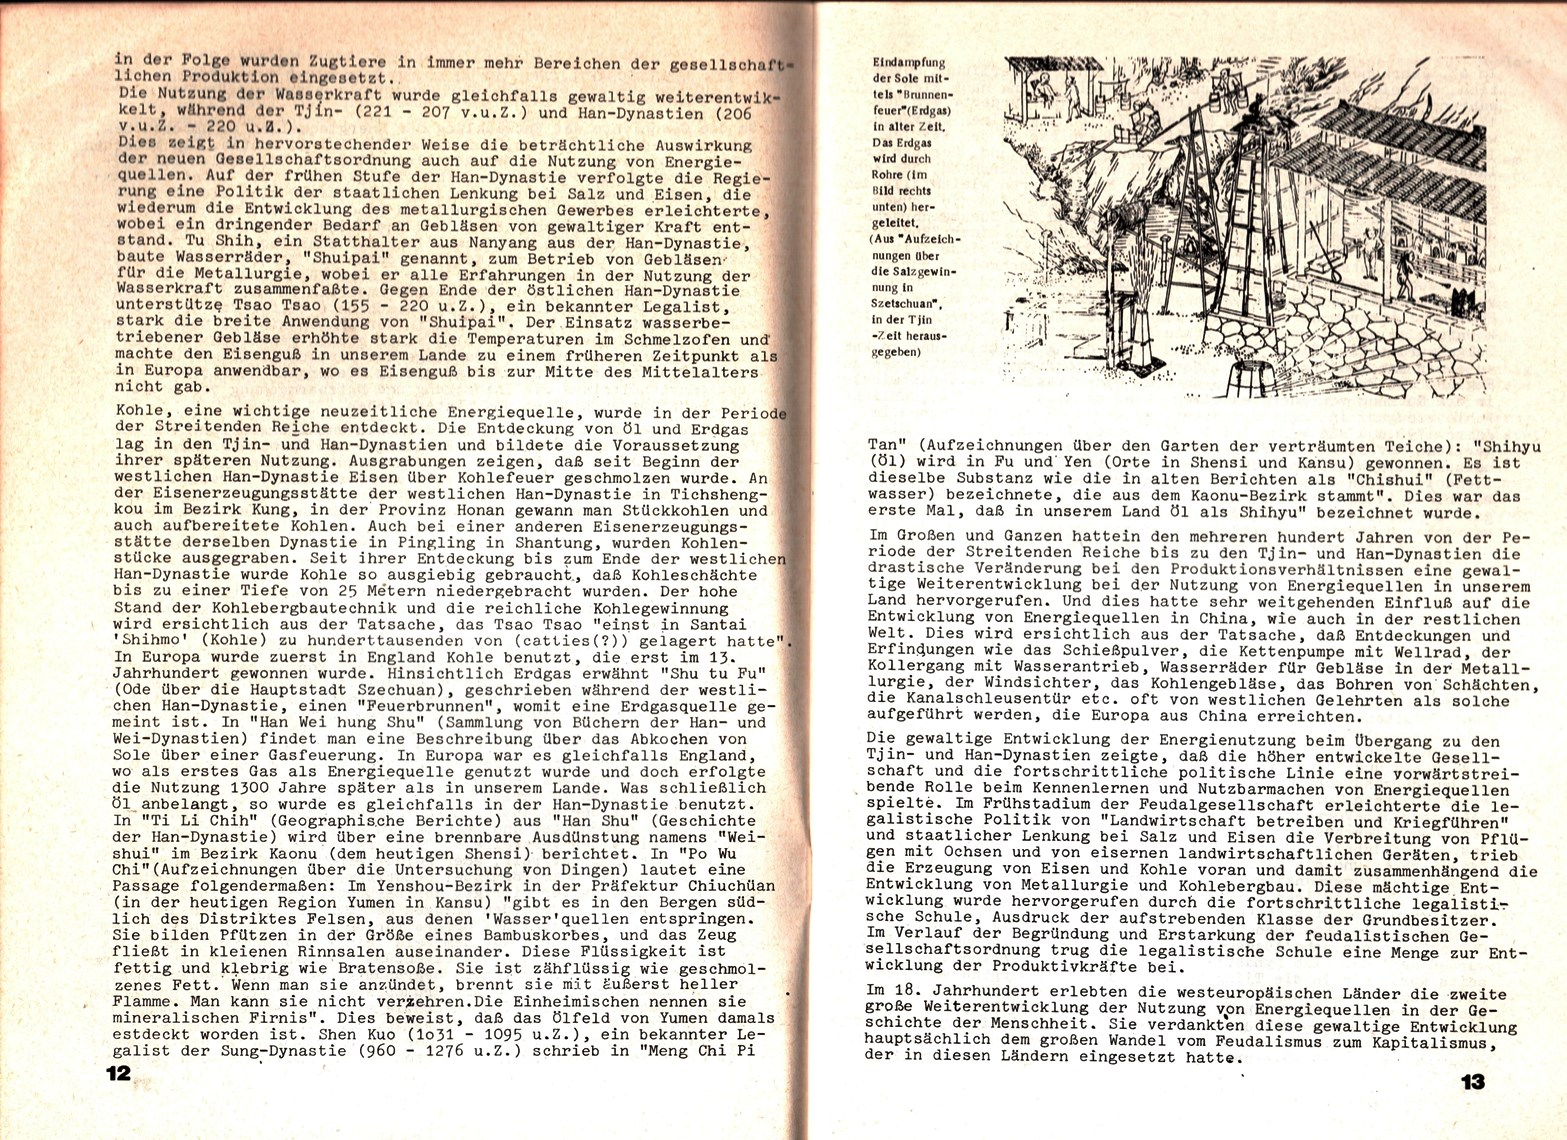 KSV_1976_Atomenergie_im_Kapitalismus_008